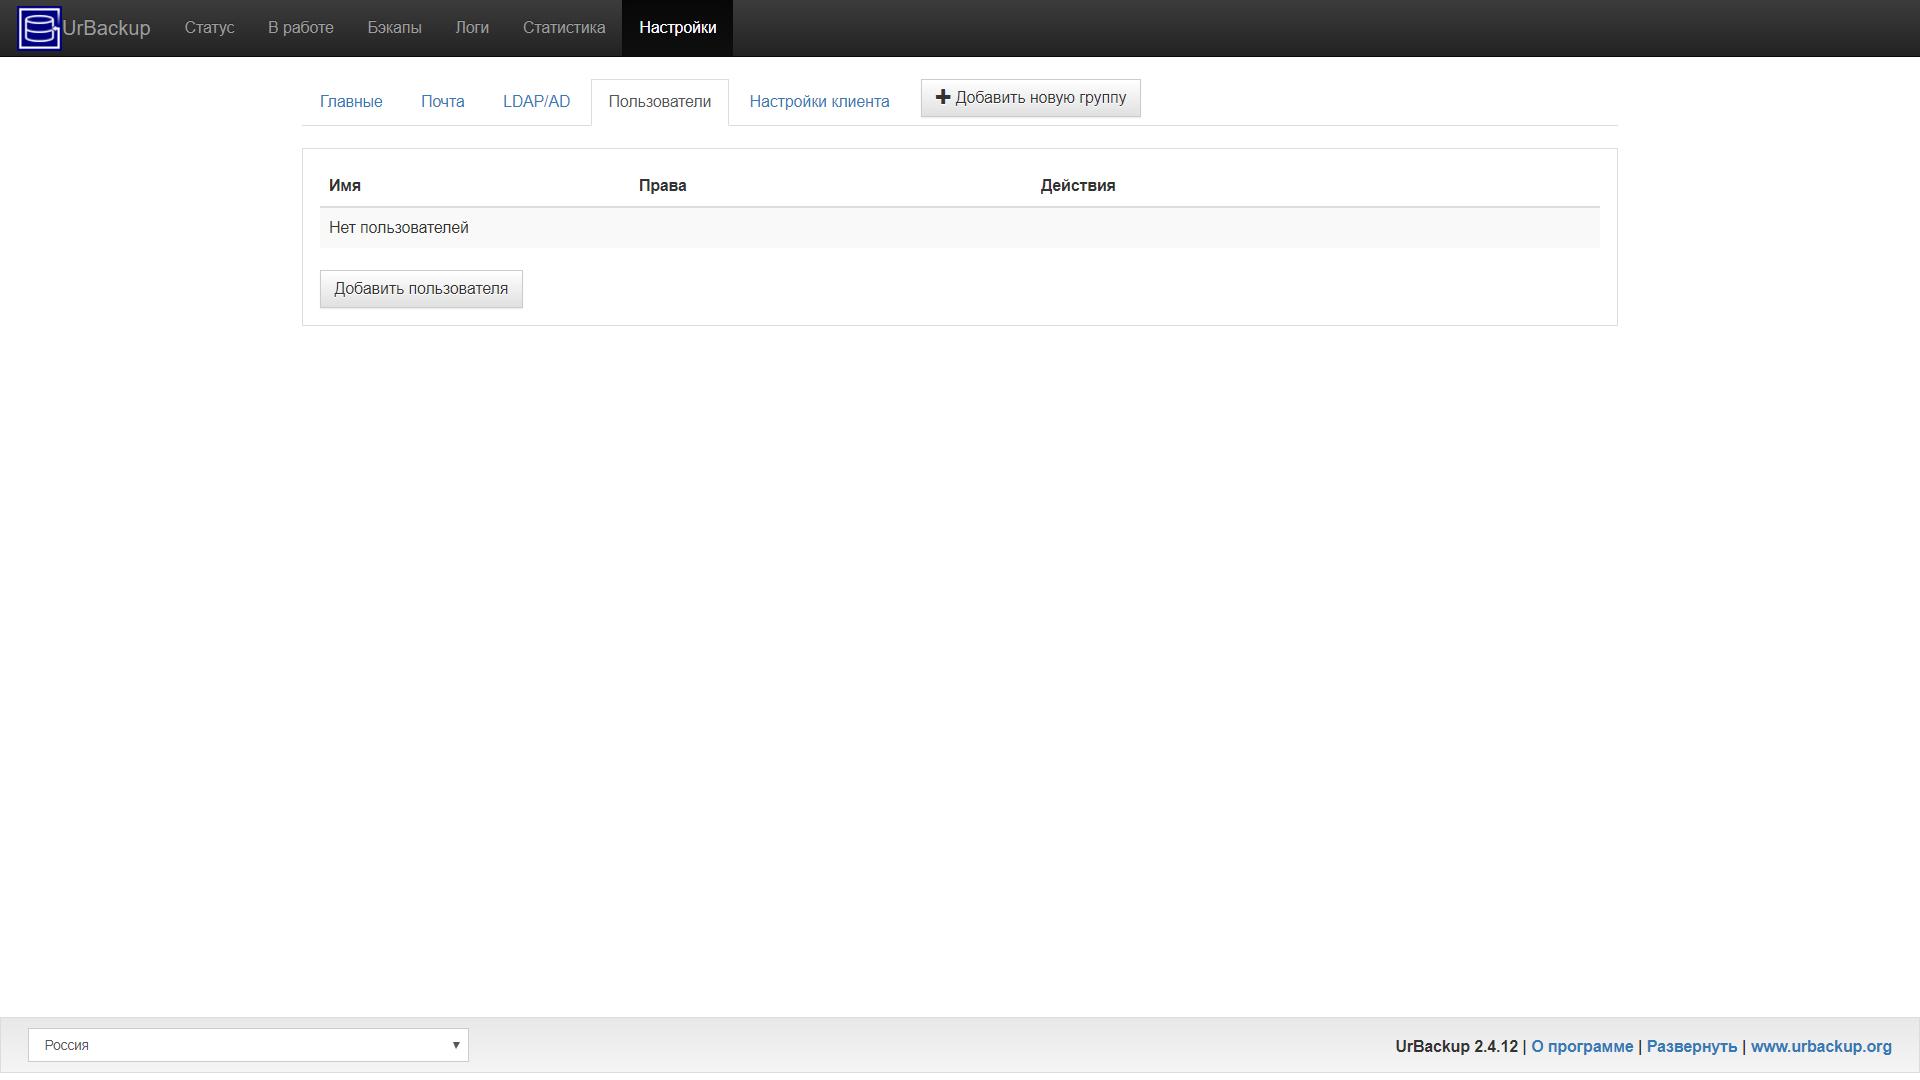 Настройки сервера UrBackup